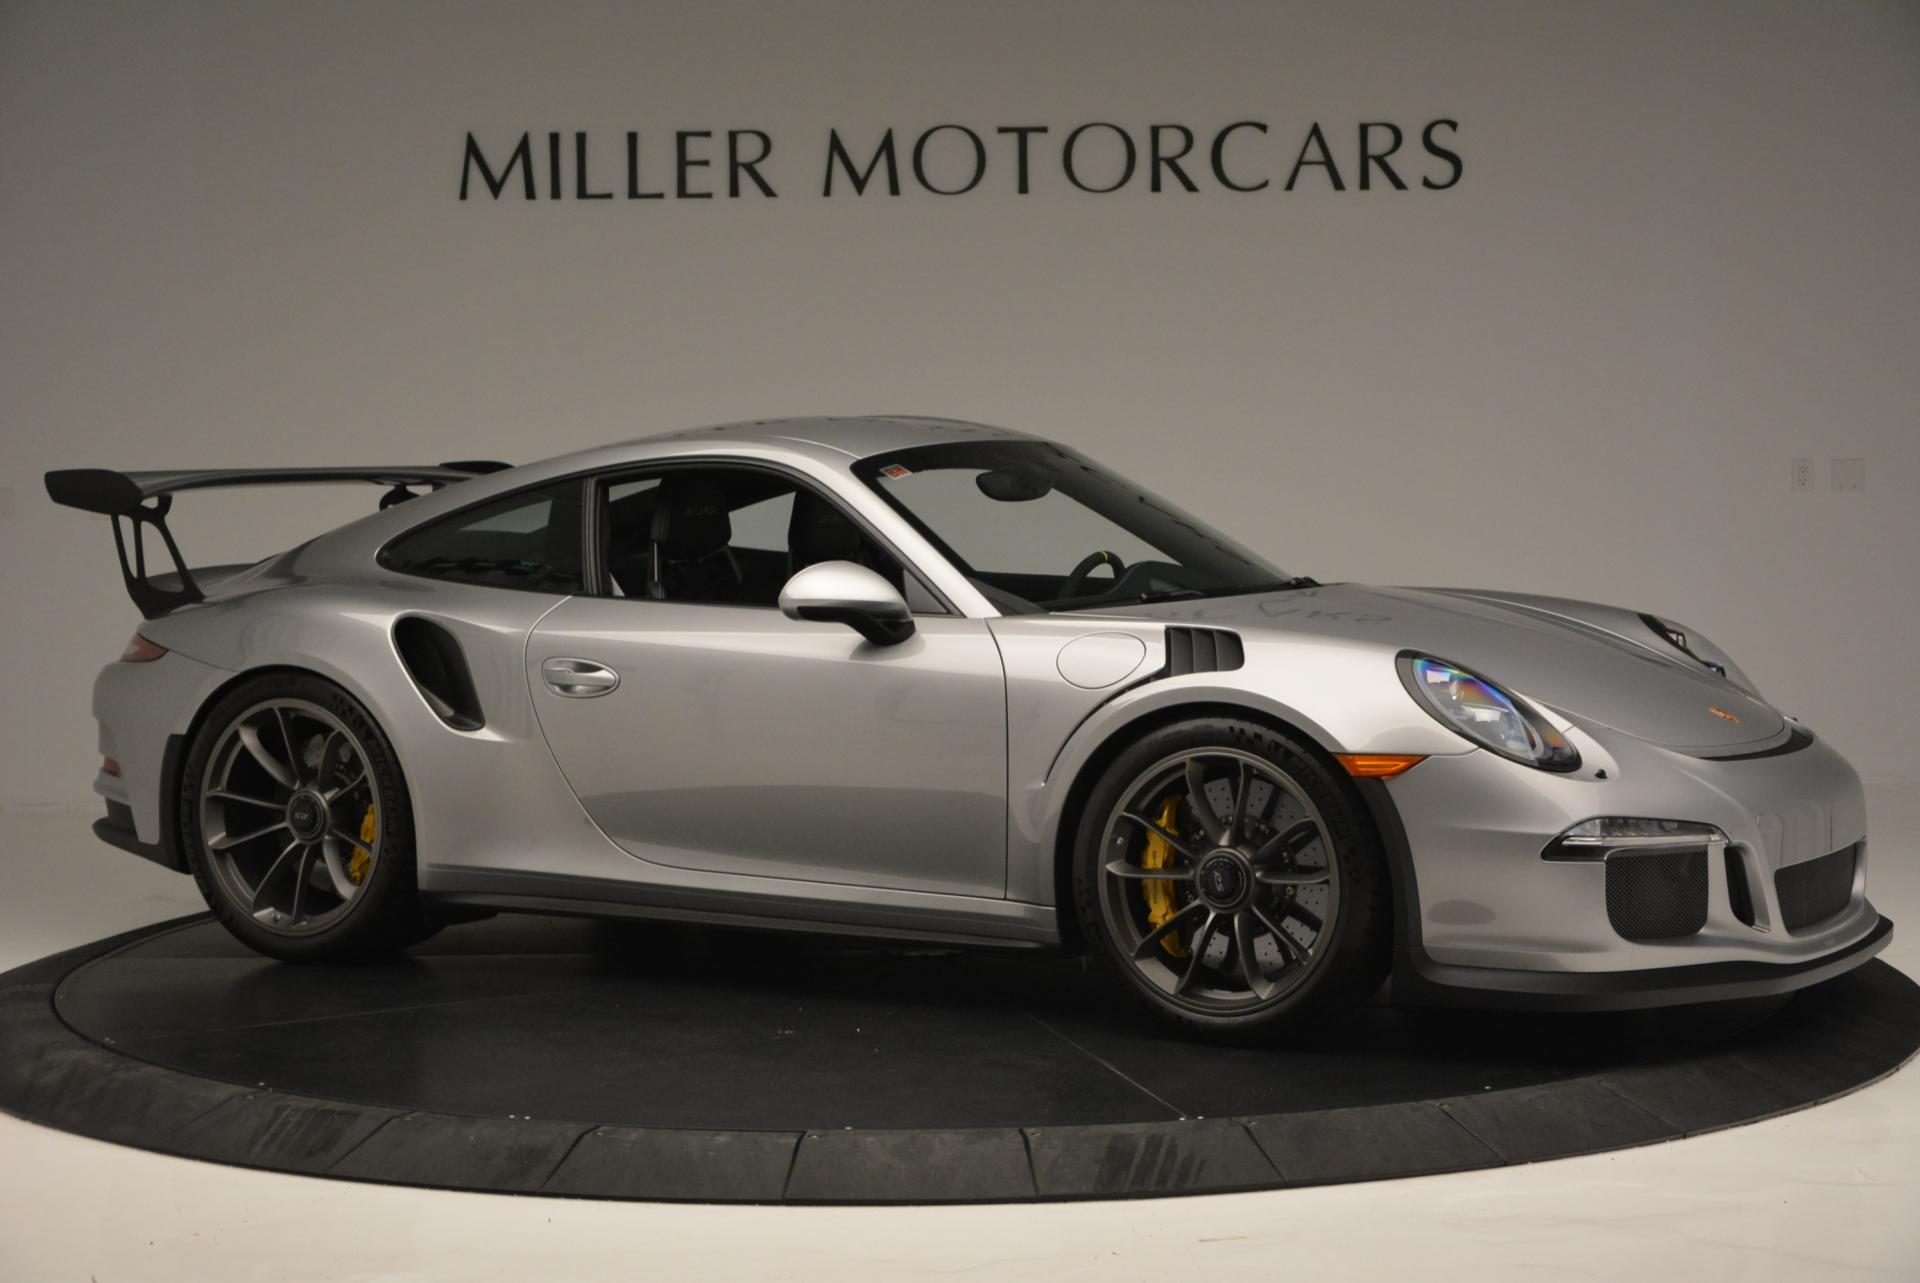 Used 2016 Porsche 911 GT3 RS For Sale In Westport, CT 112_p10